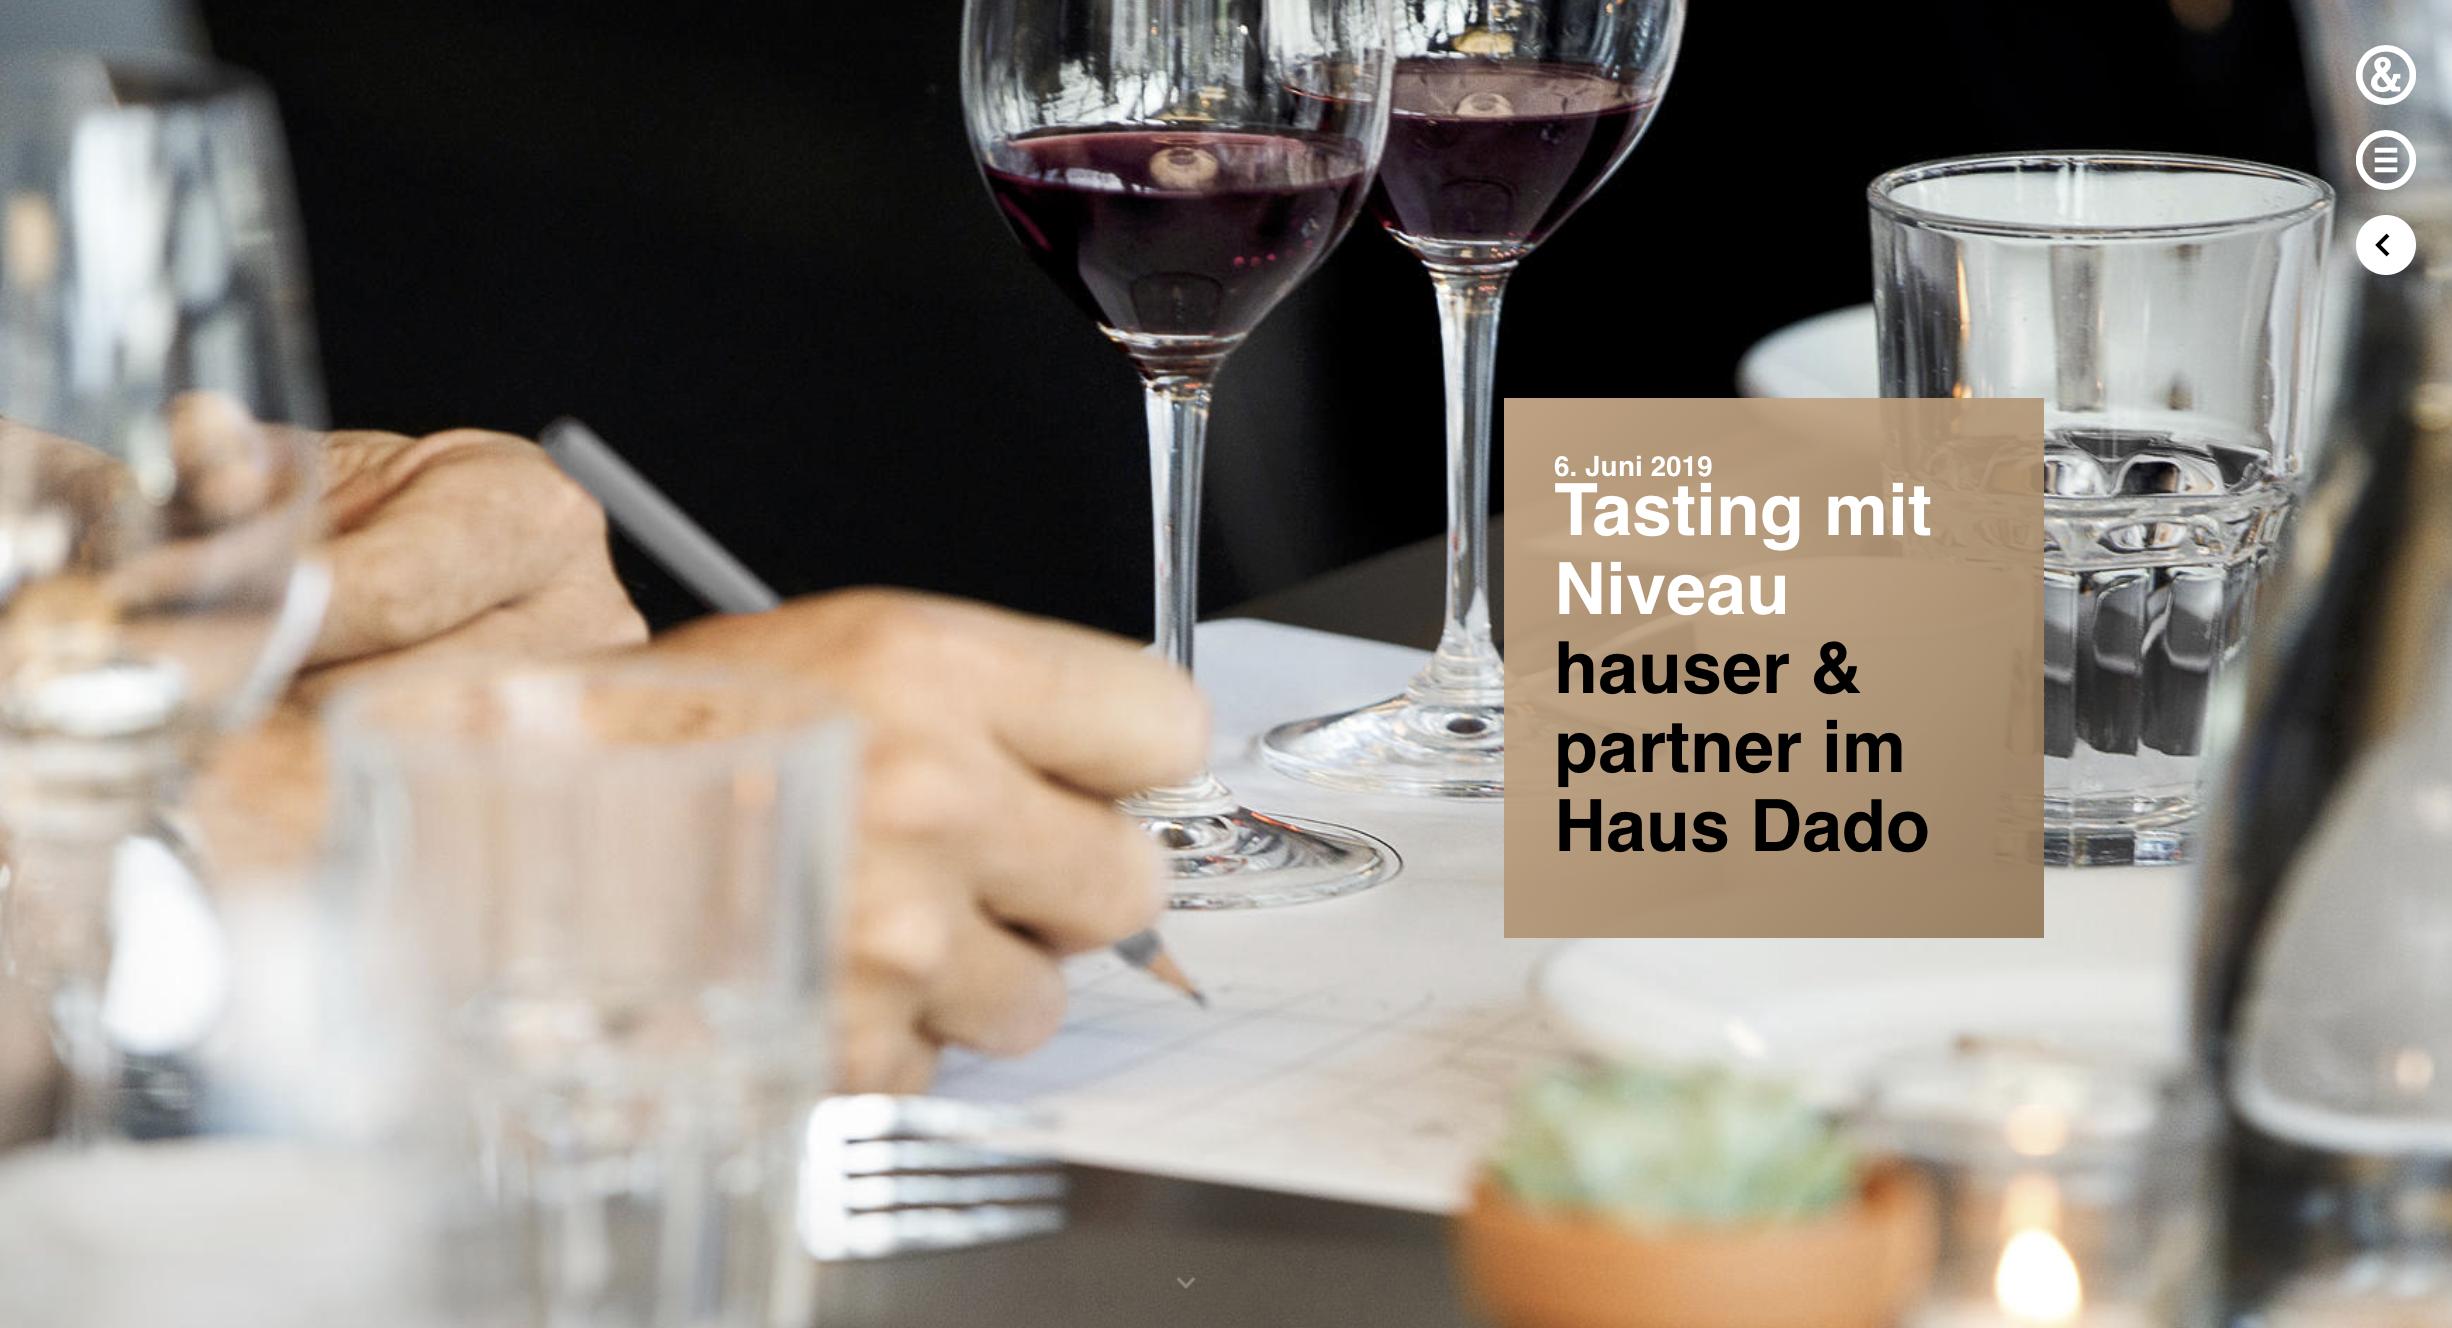 Tasting mit Niveau | Hauser & Partner Eventbilder